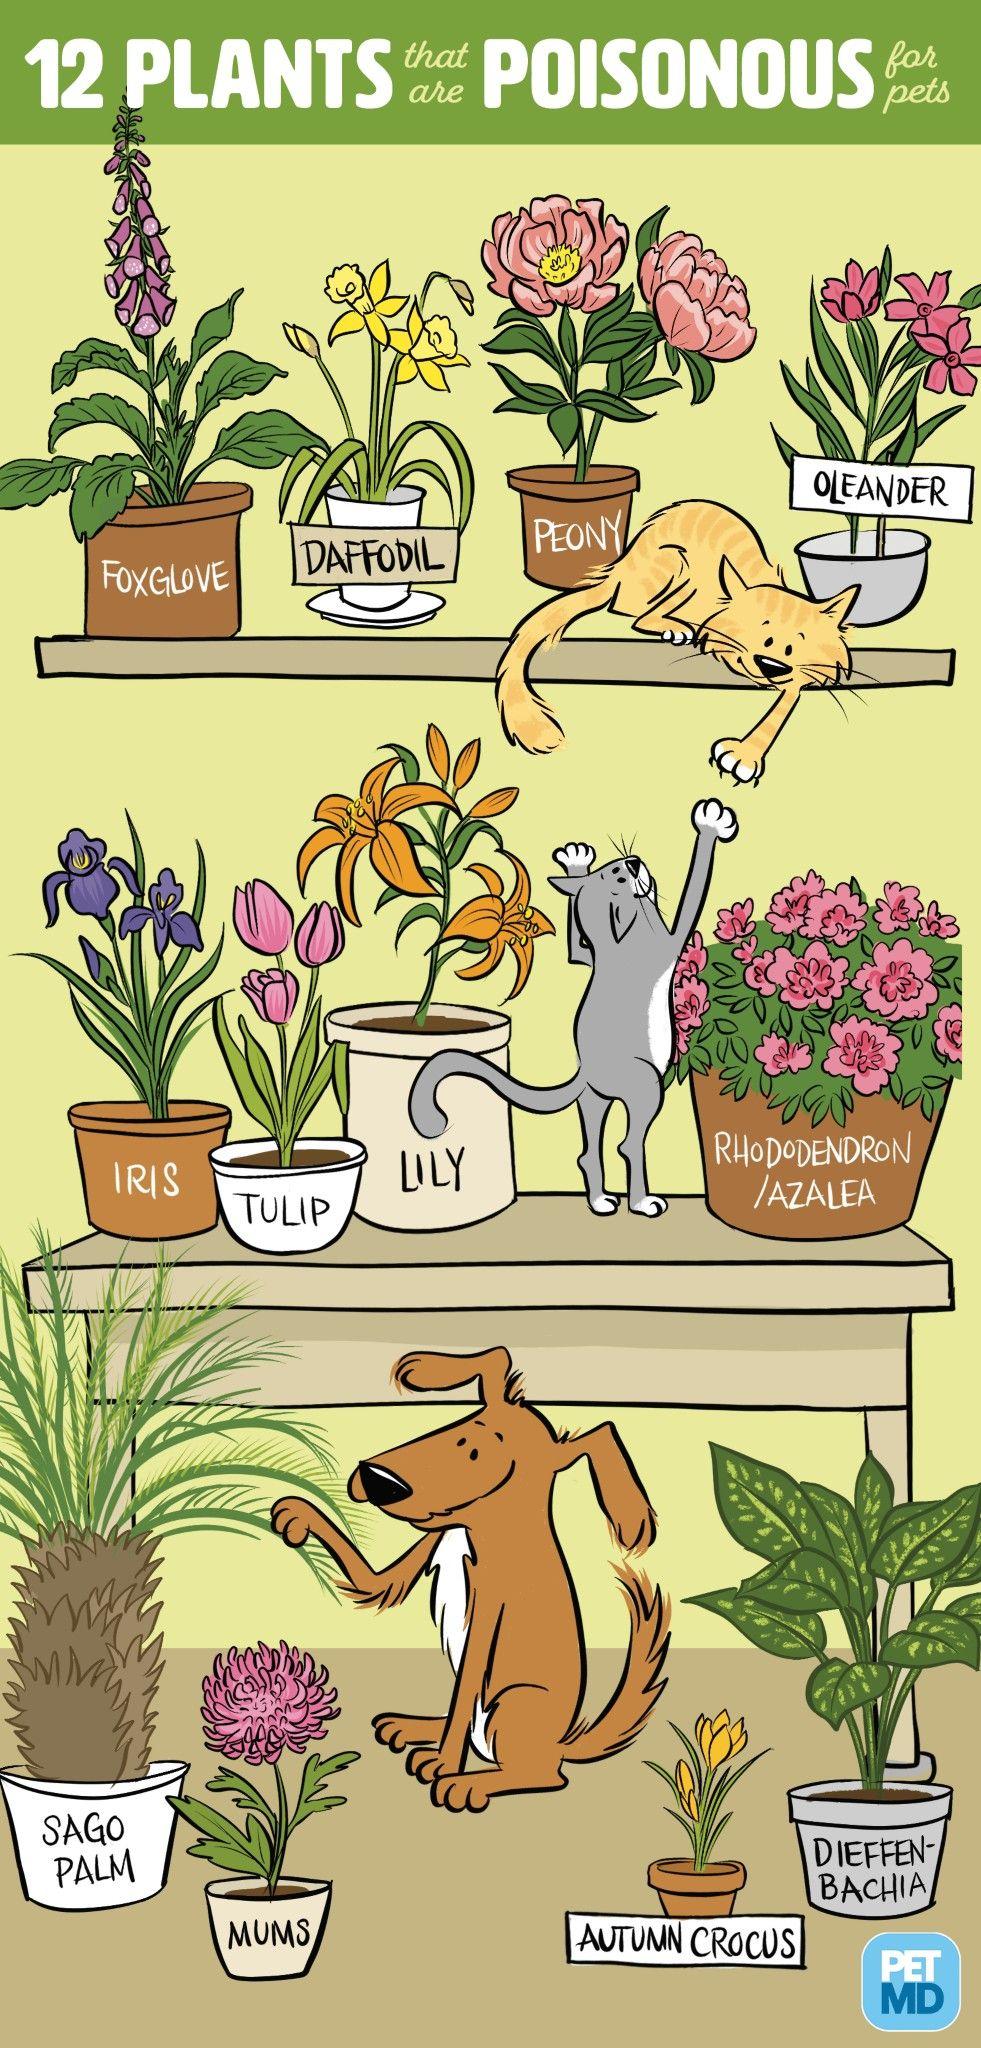 Pin By Beks On Balcony Garden Cat Plants Poisonous Plants Cat Flowers